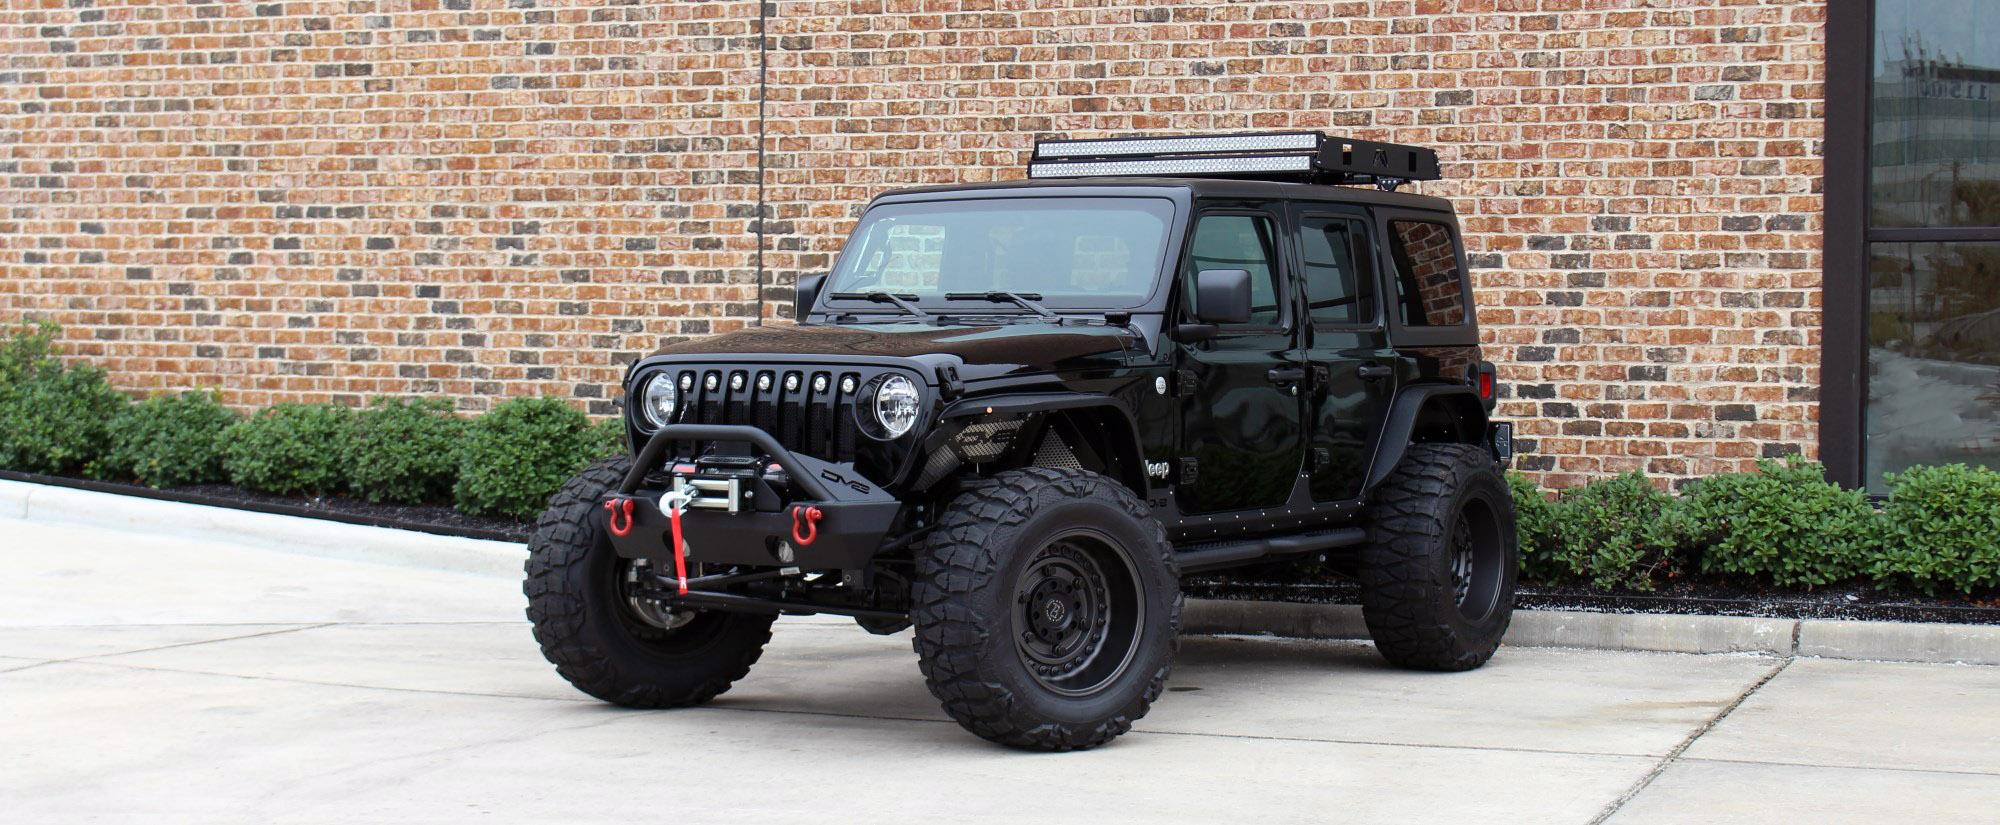 2018 jeep wrangler unlimited jl black